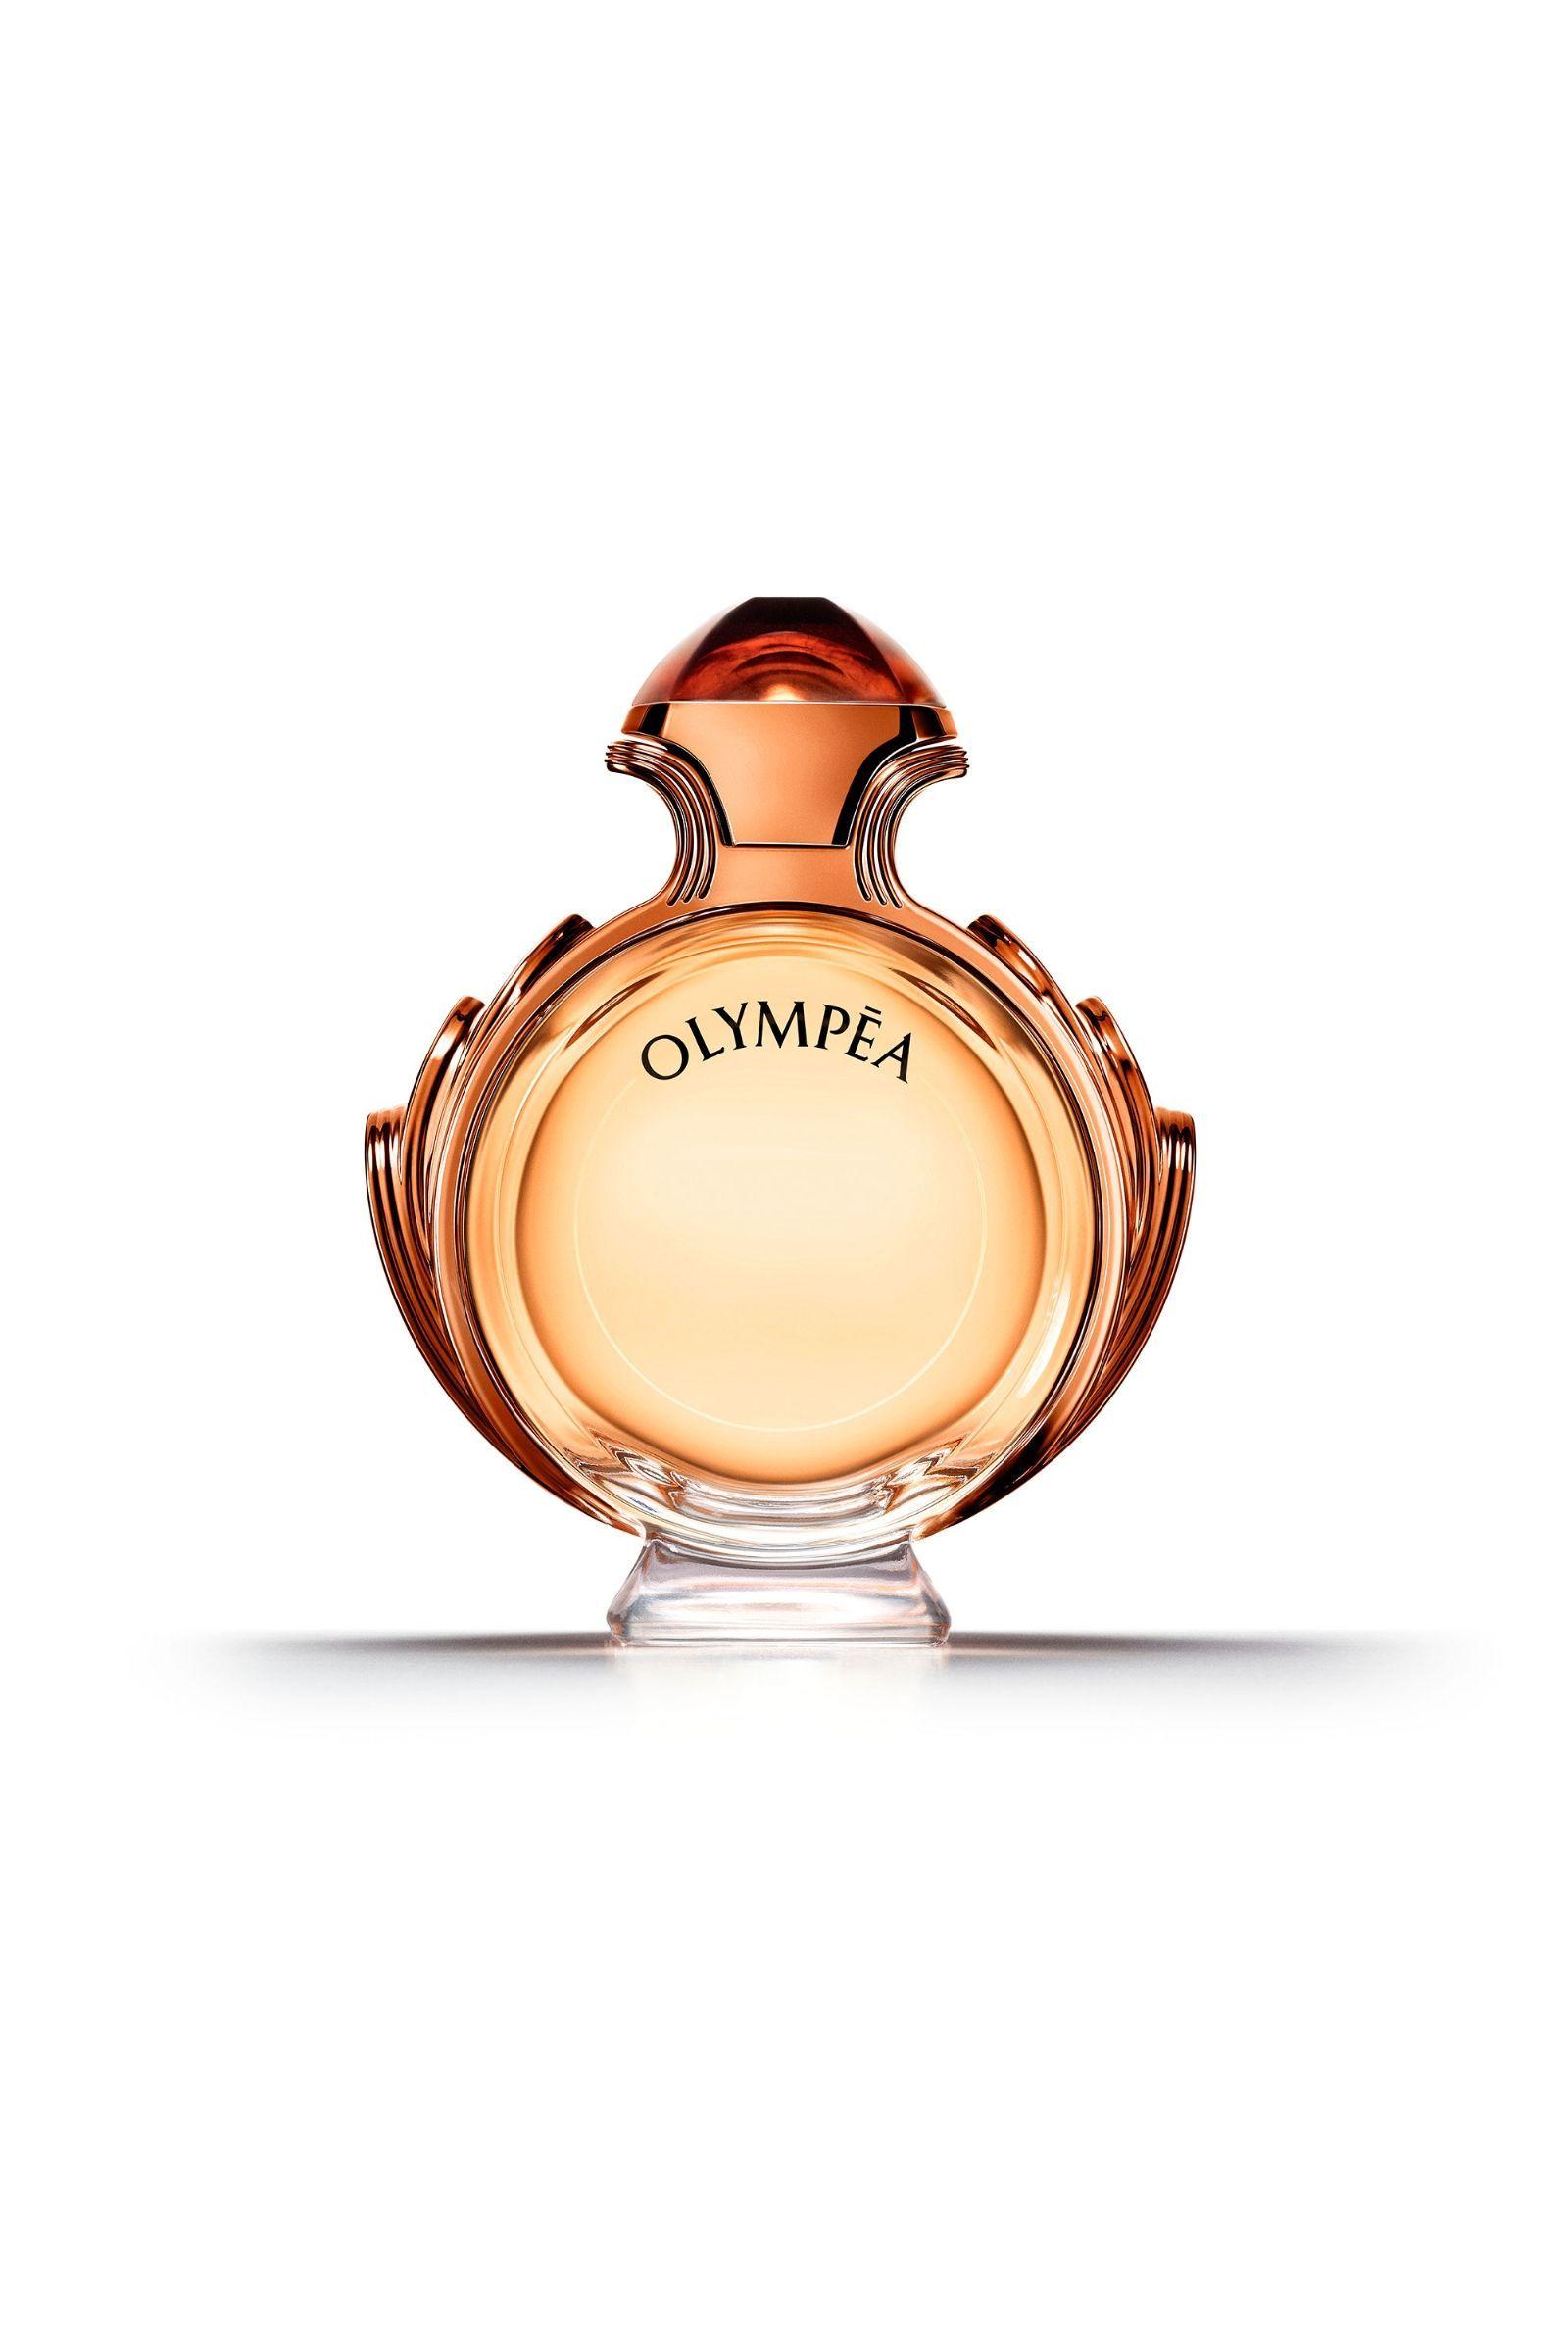 Paco Rabanne Olympéa Intense Eau de Parfum Spray  - Cosmopolitan.com